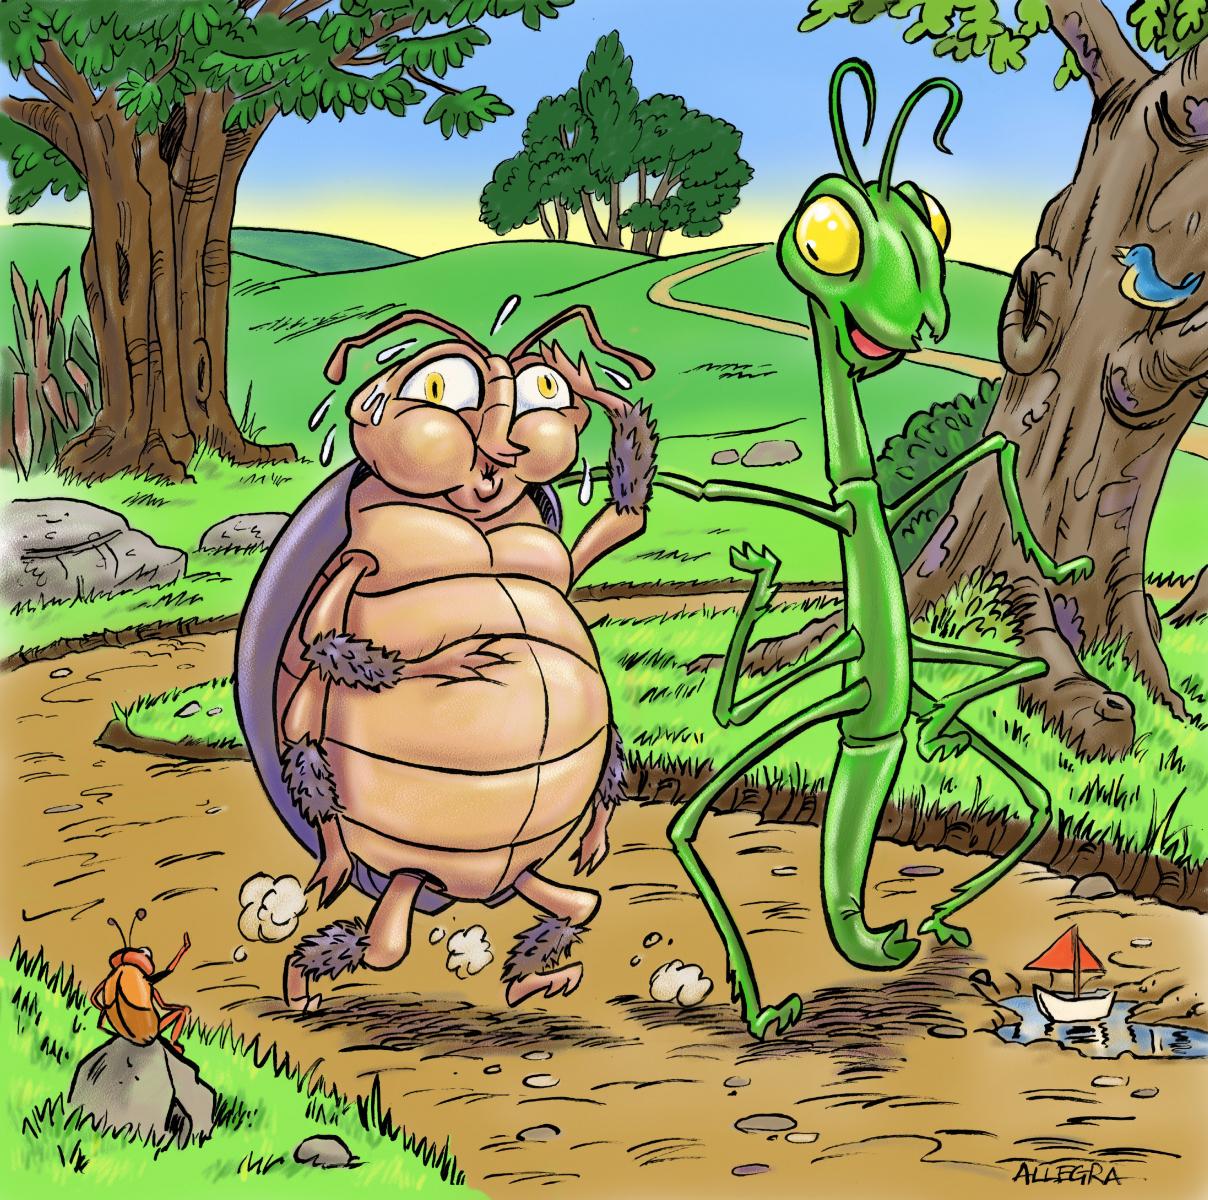 Two bugs walking